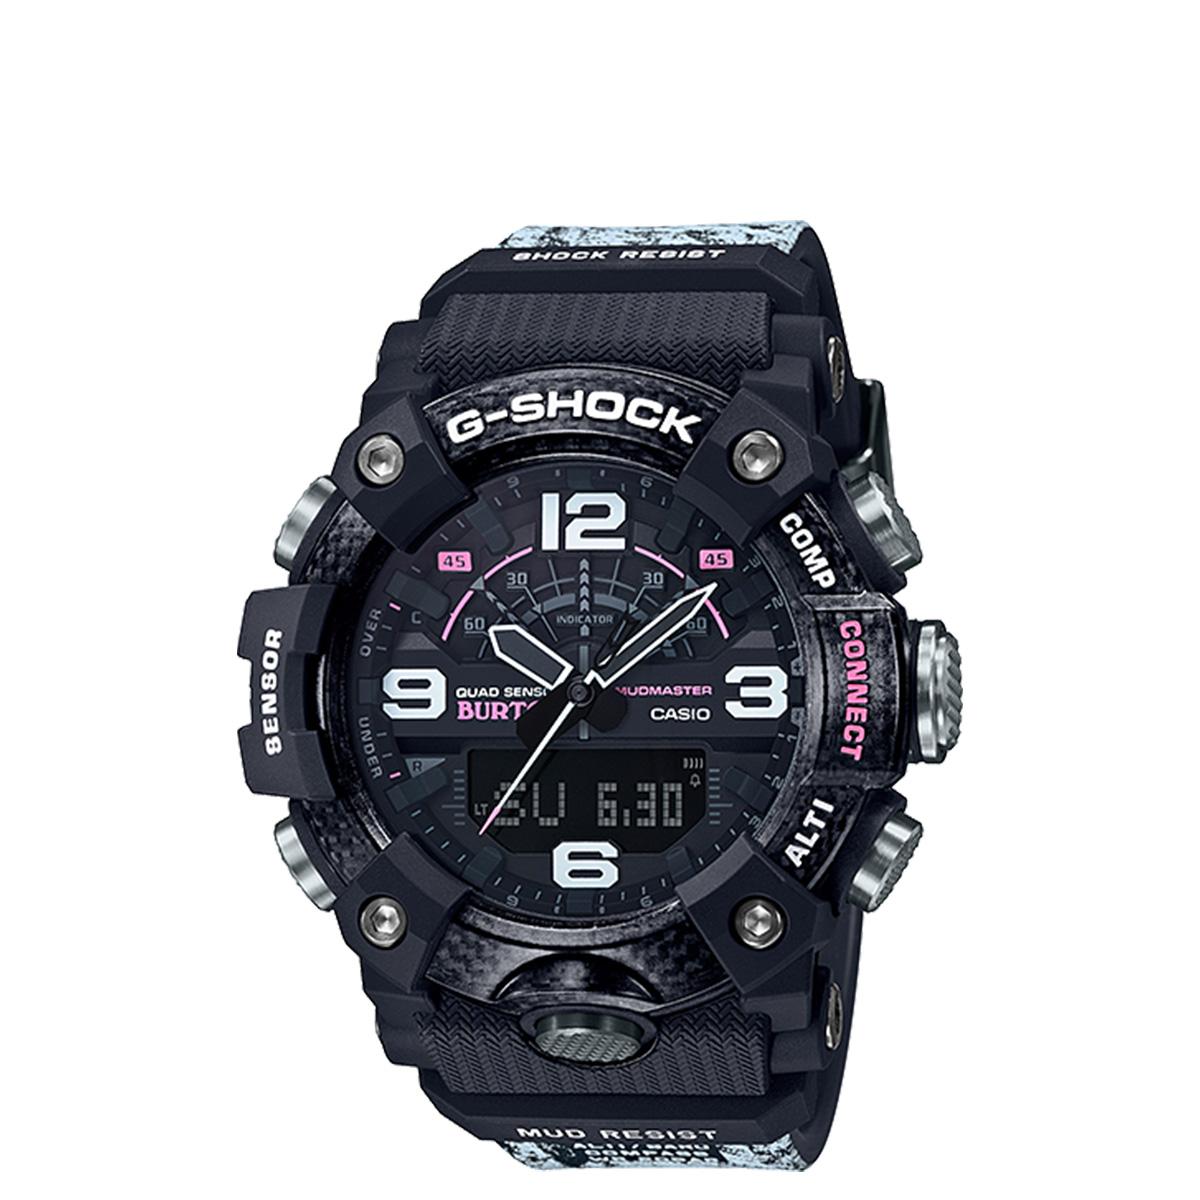 CASIO G-SHOCK BURTON カシオ 腕時計 バートン GG-B100BTN-1AJR コラボ メンズ レディース ブラック 黒